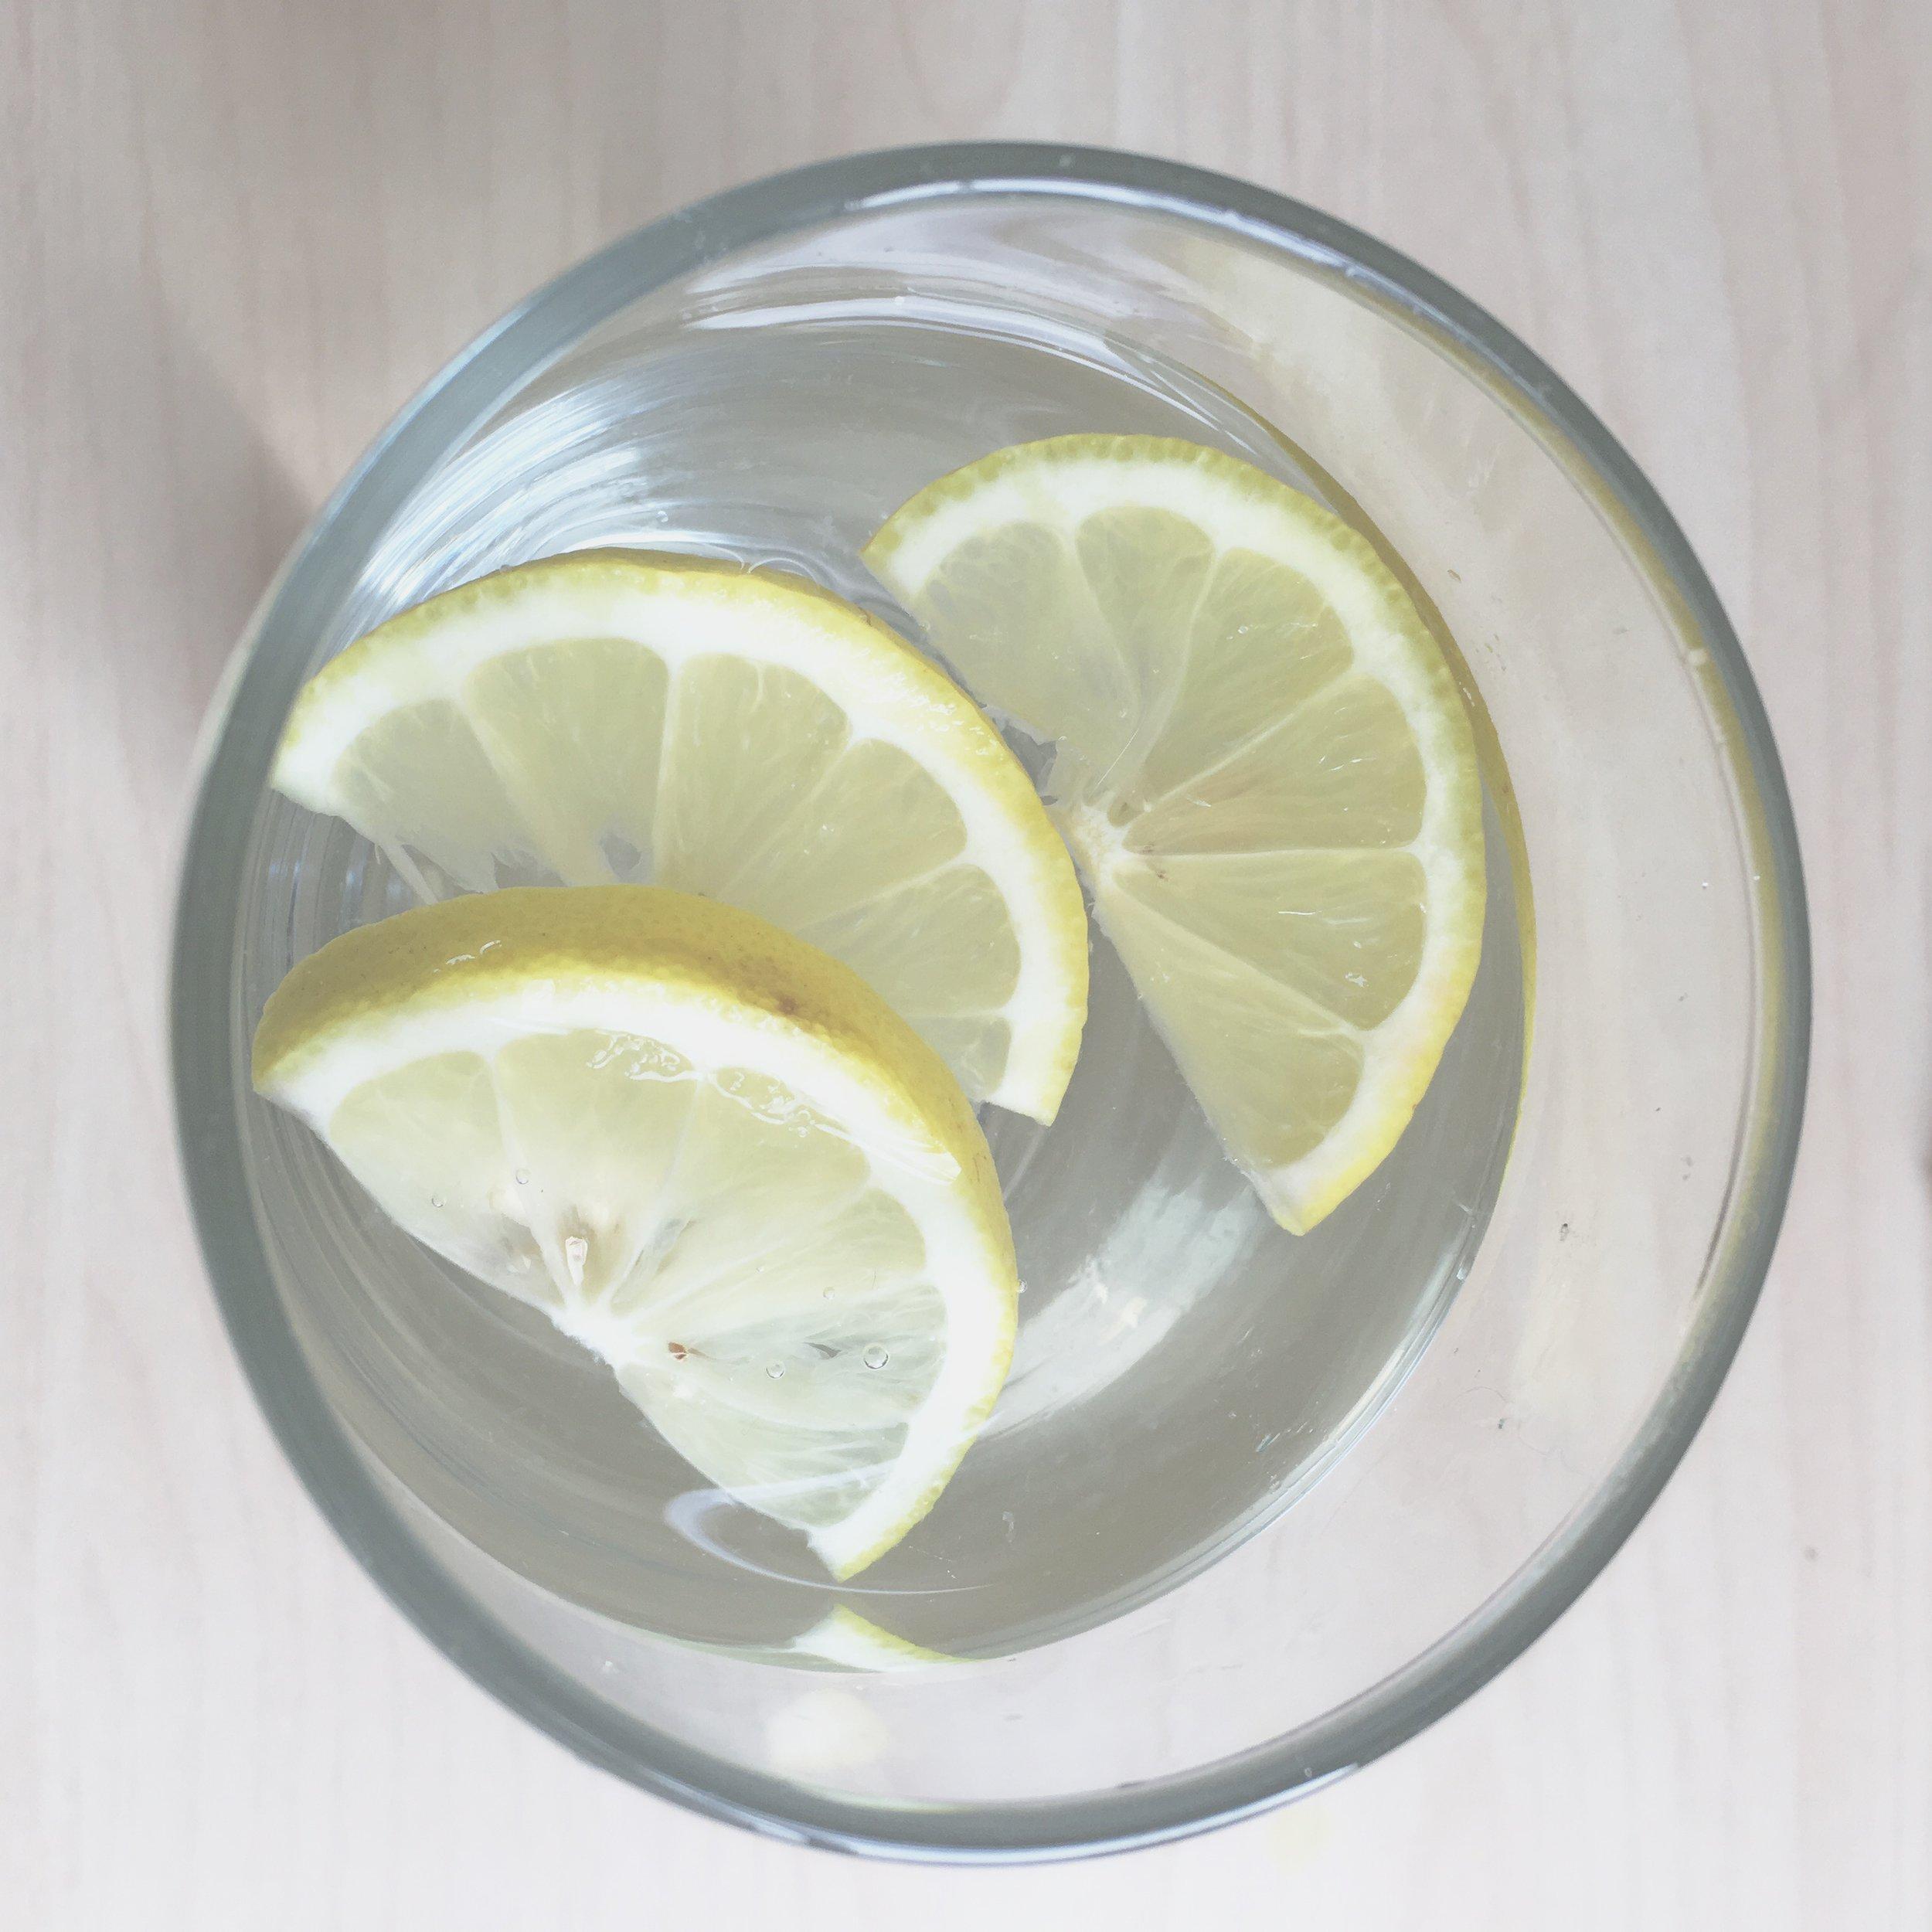 Lemon in water for detoxification - The Preggers Kitchen